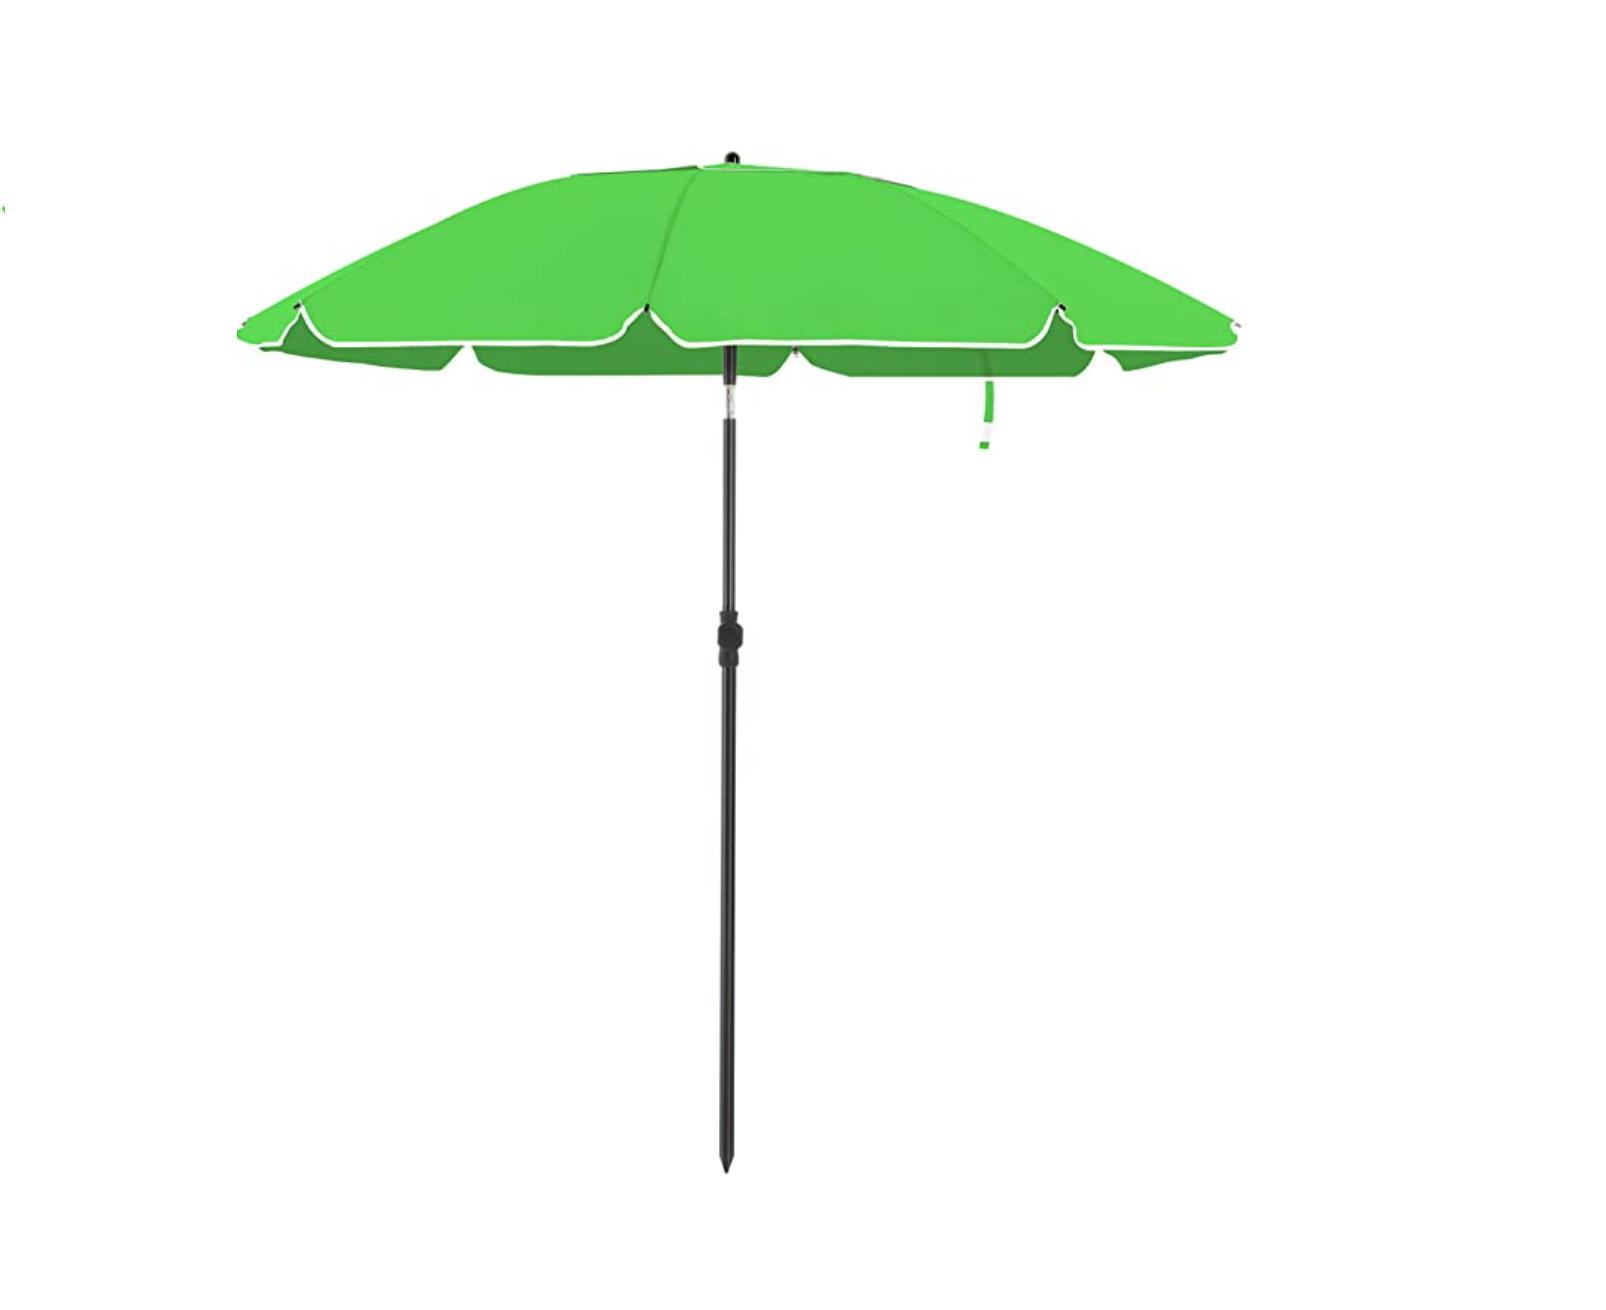 Parasol 200 cm diameter groen